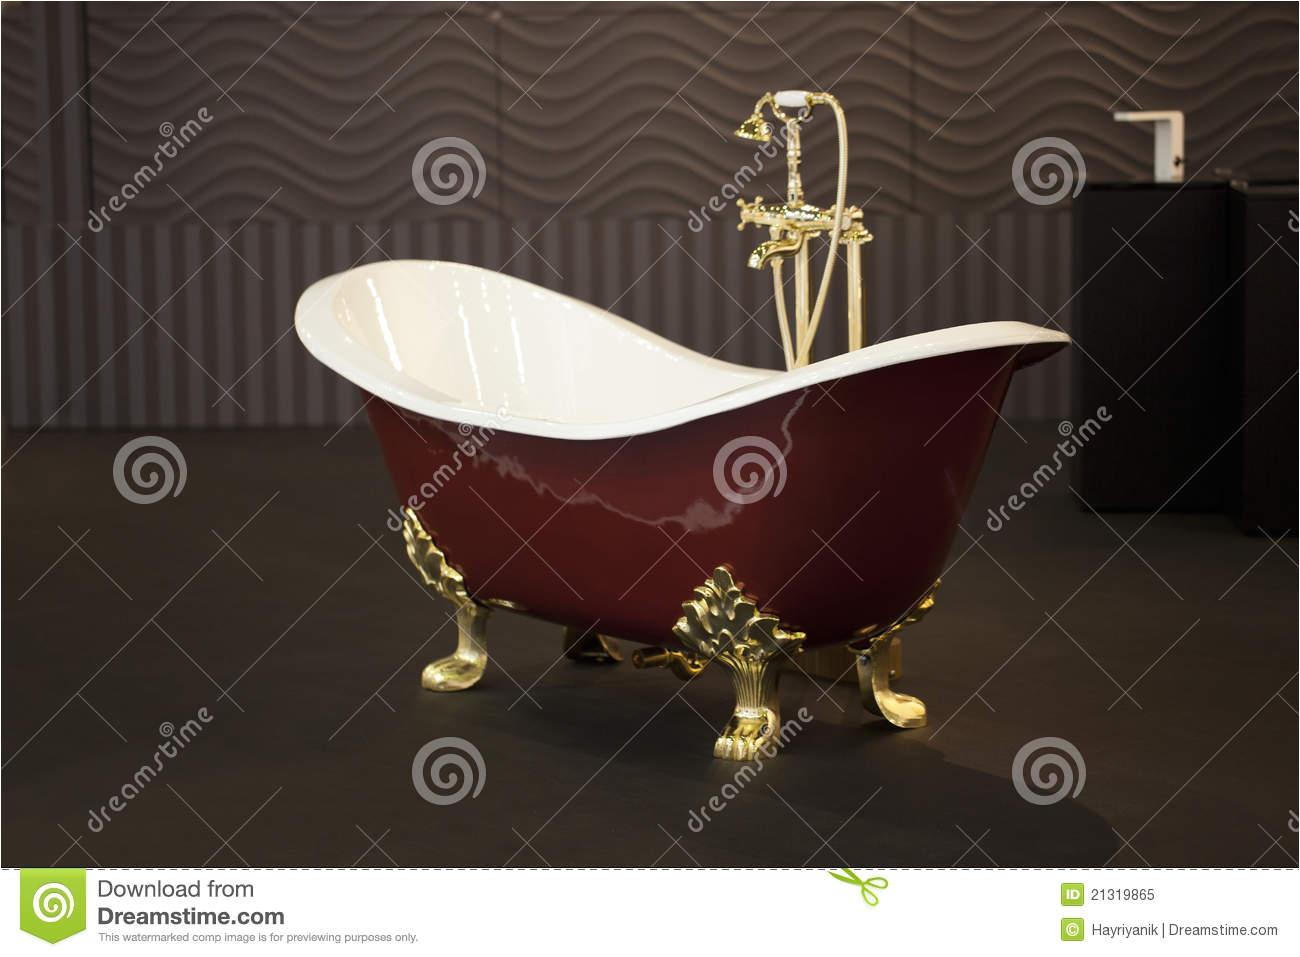 royalty free stock photo gold clawfoot bath tub image